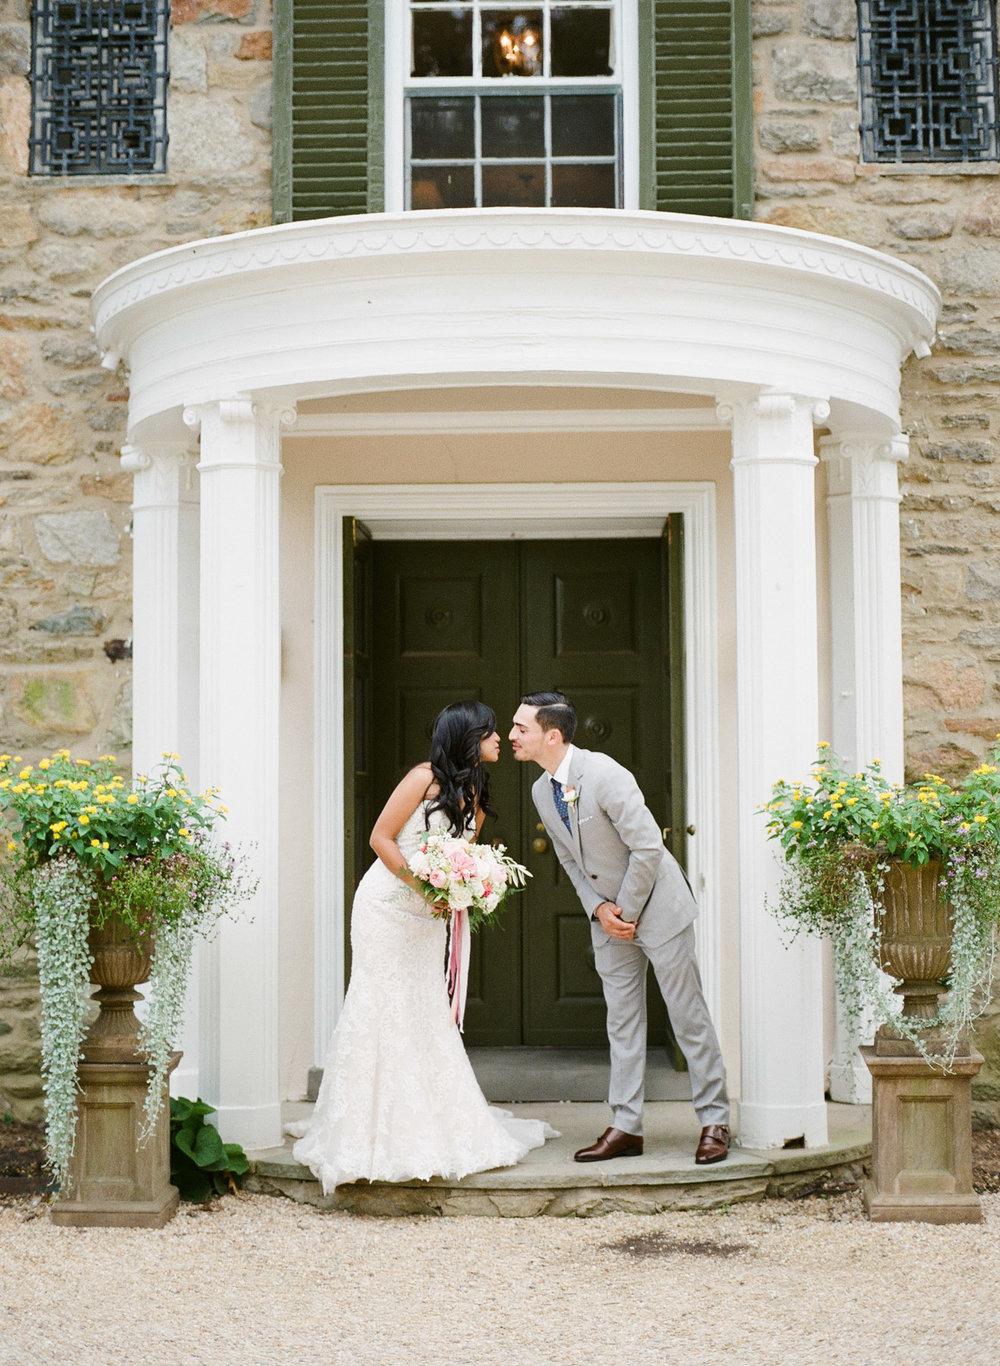 Virginia-Film-Photographer-Wedding-22.jpg